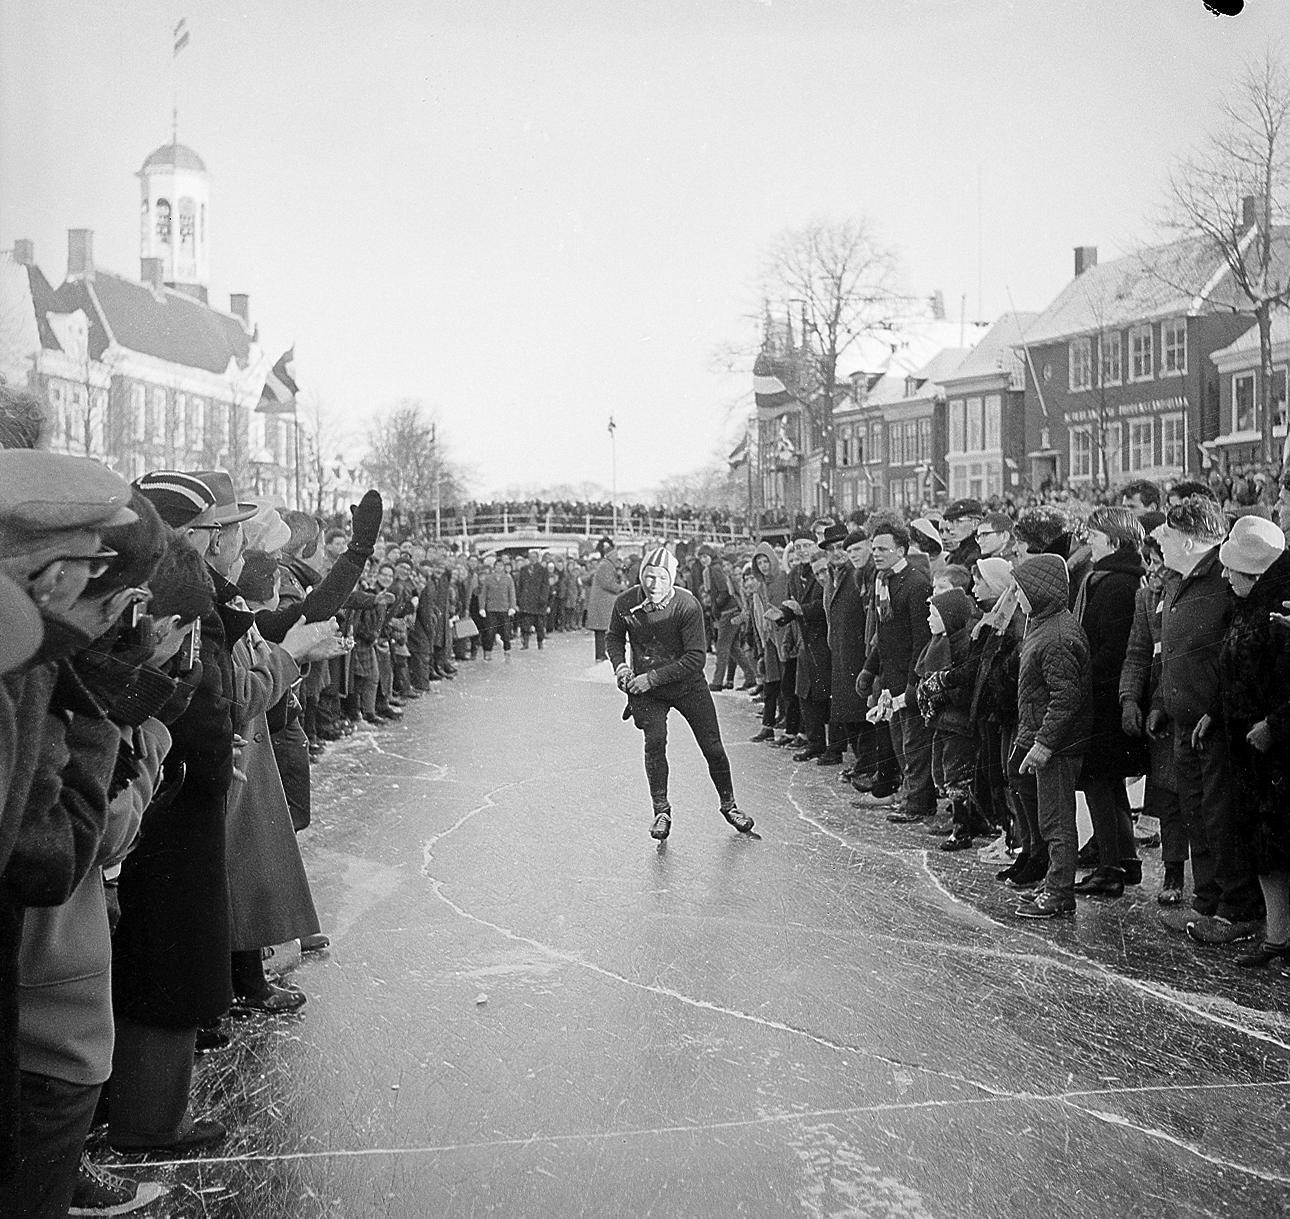 18 januari 1963: zwaarste Elfstedentocht ooit